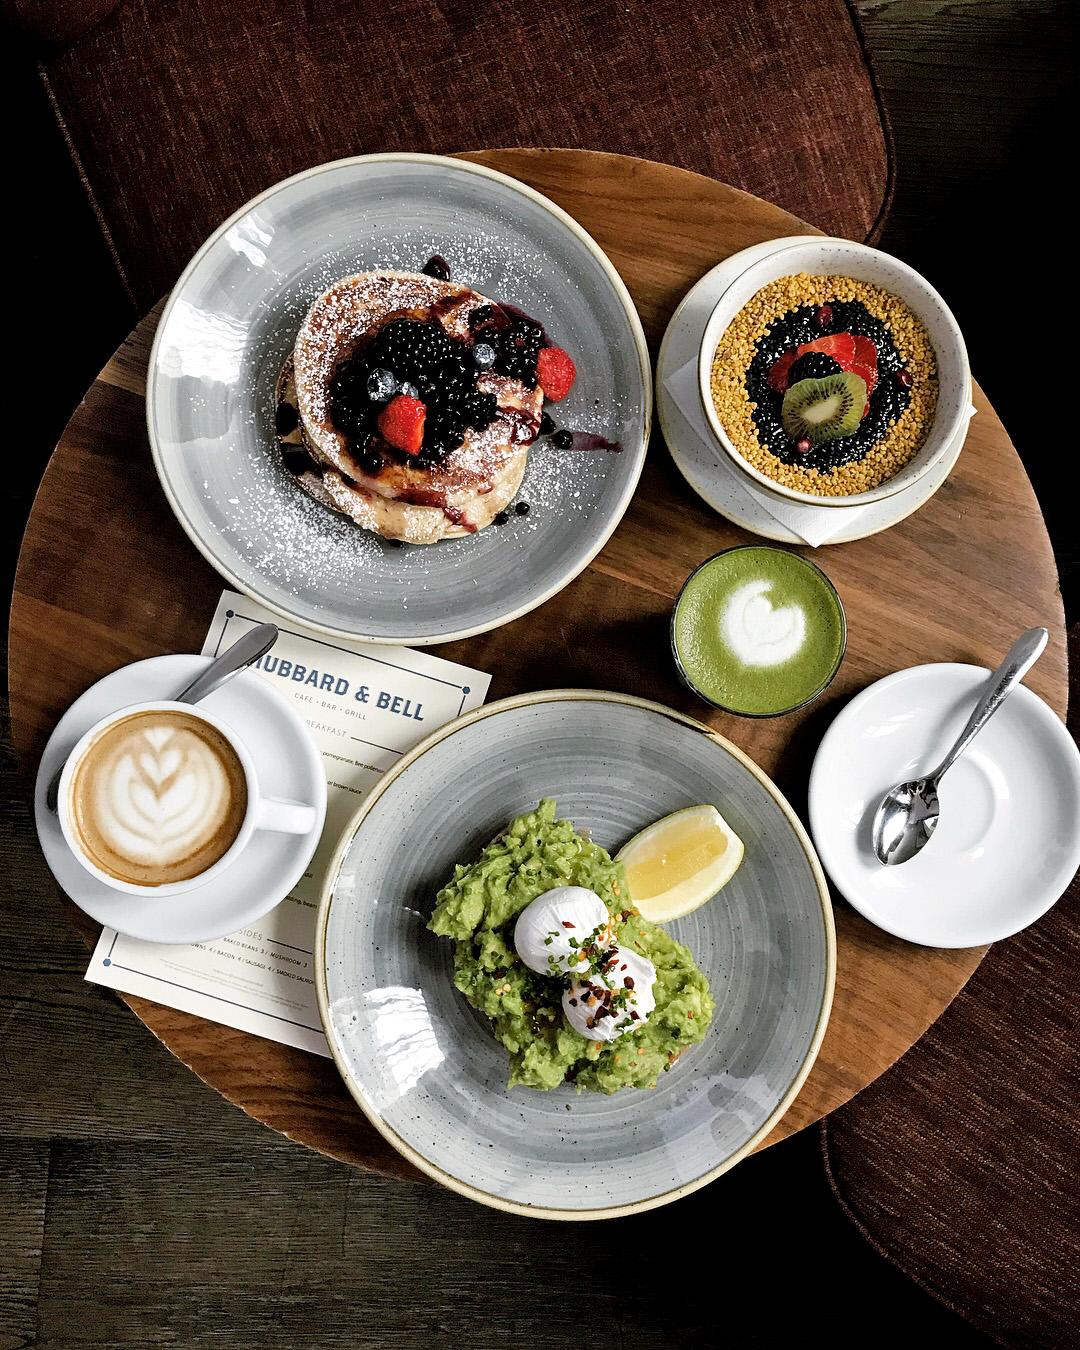 Breakfast at Hubbard & Bell, The Hoxton Hotel, Holborn London